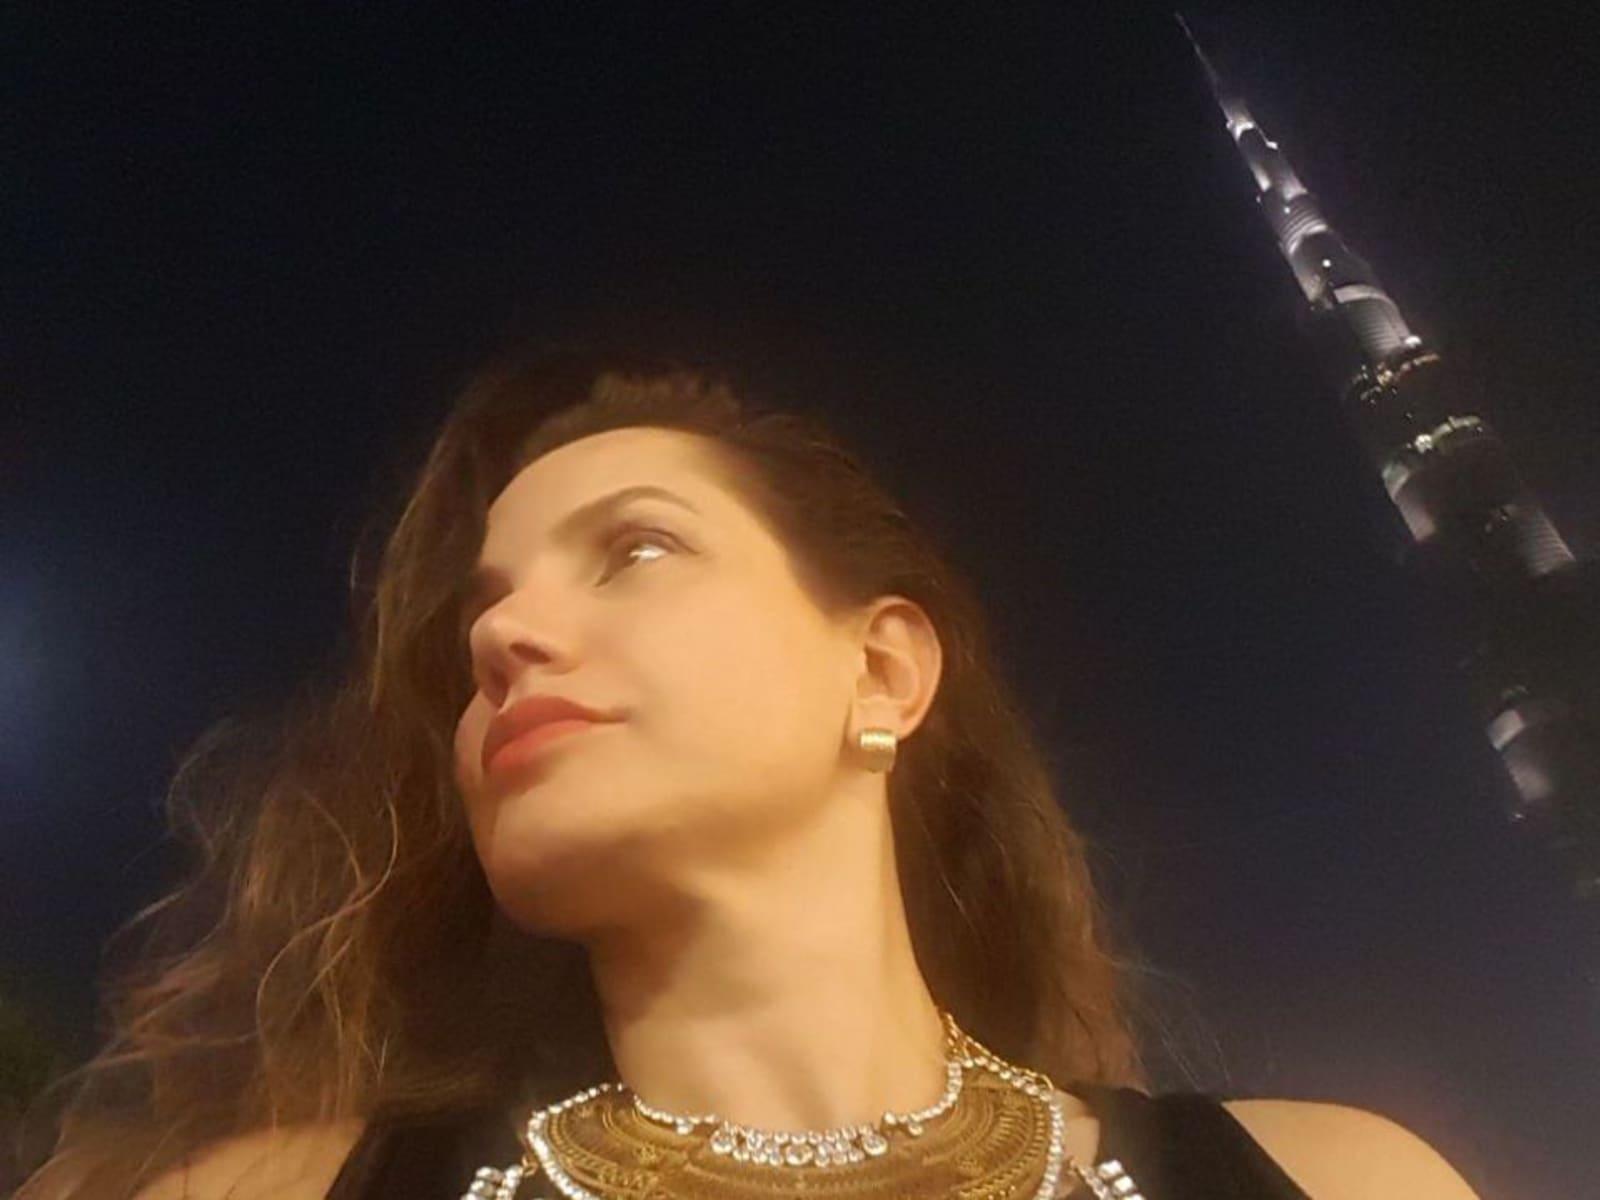 Juliana from Dubai, United Arab Emirates